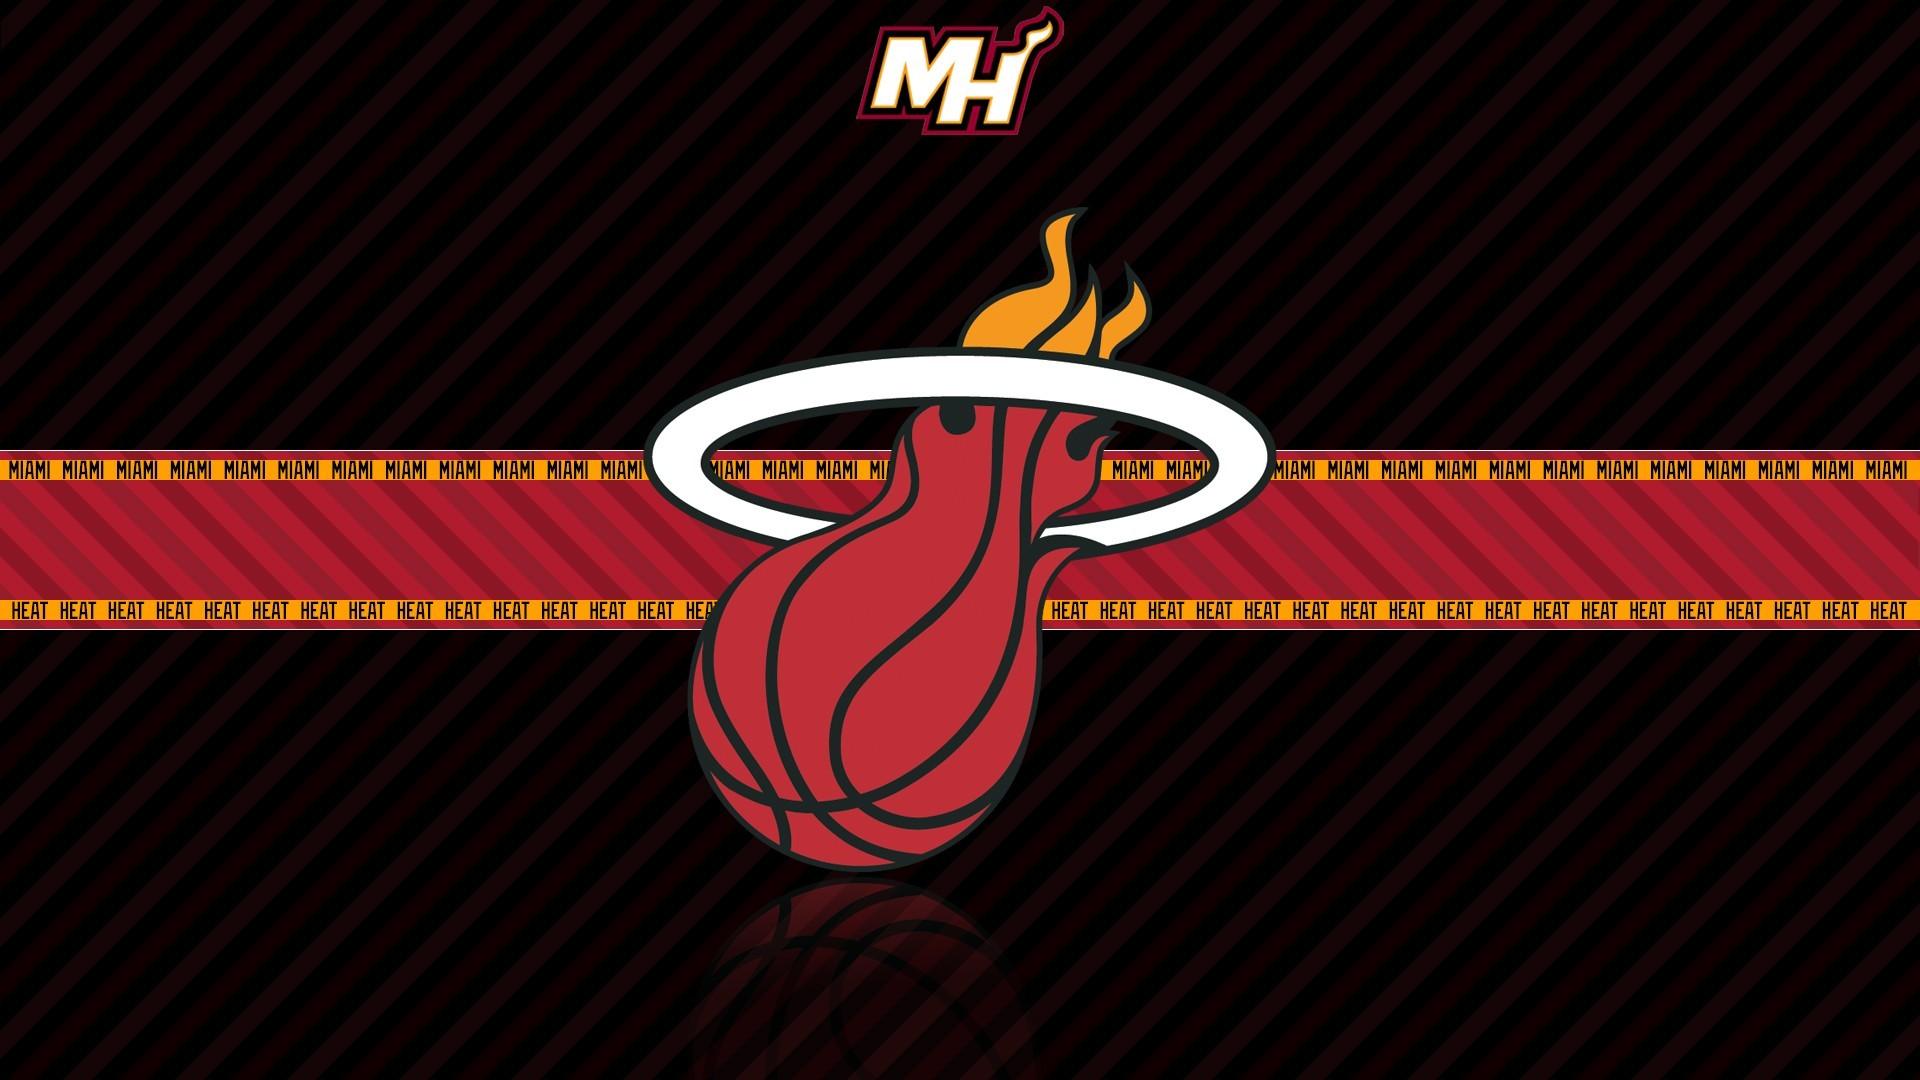 Miami heat desktop wallpaper wallpapertag - Miami heat wallpaper android download ...